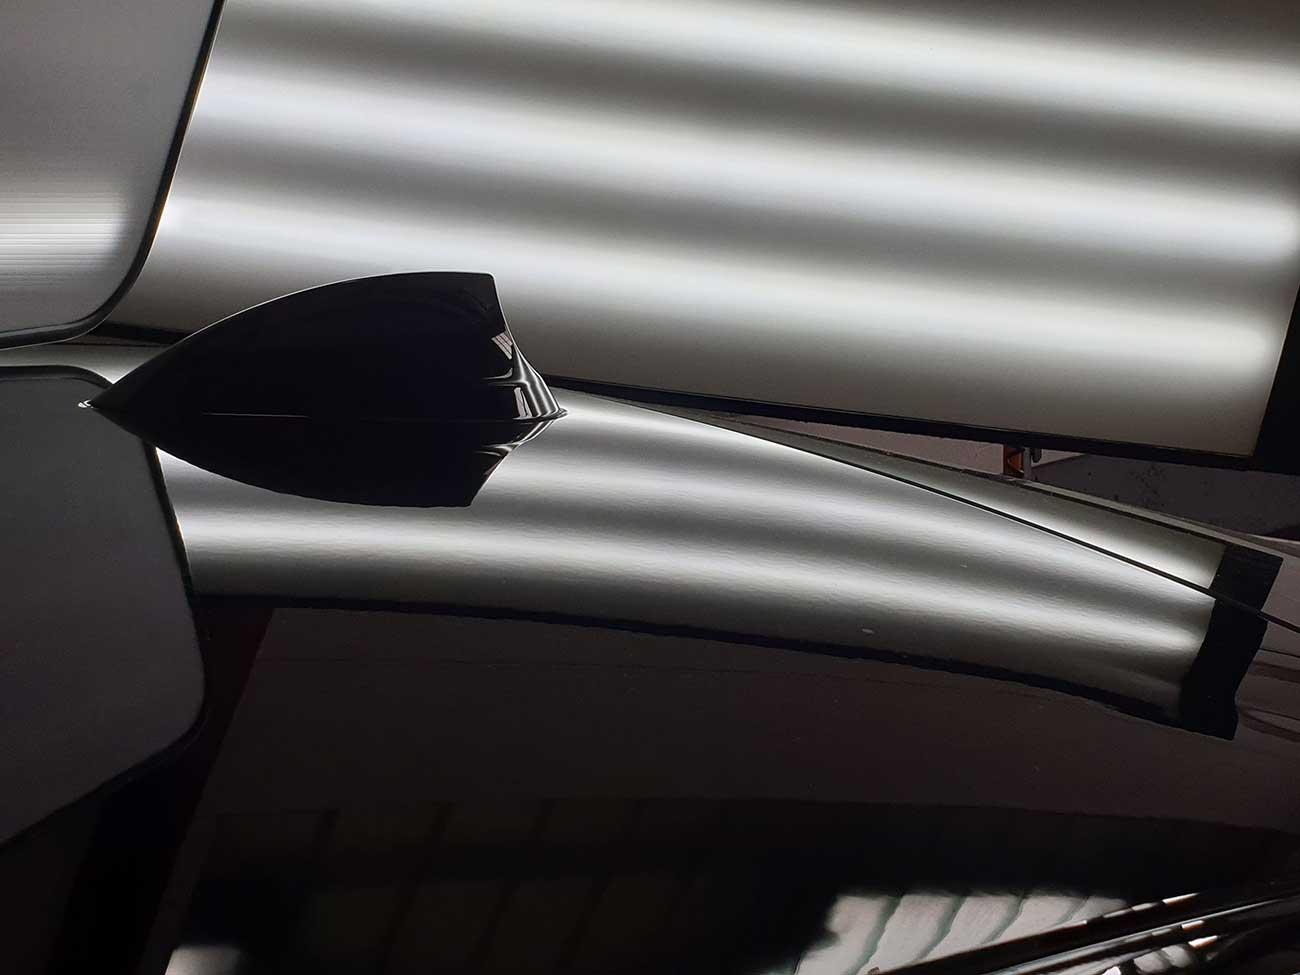 Reparierte Delle auf Fahrzeugdach-Beulendoktor Kassel-Die Fahrzeug-Ambulanz